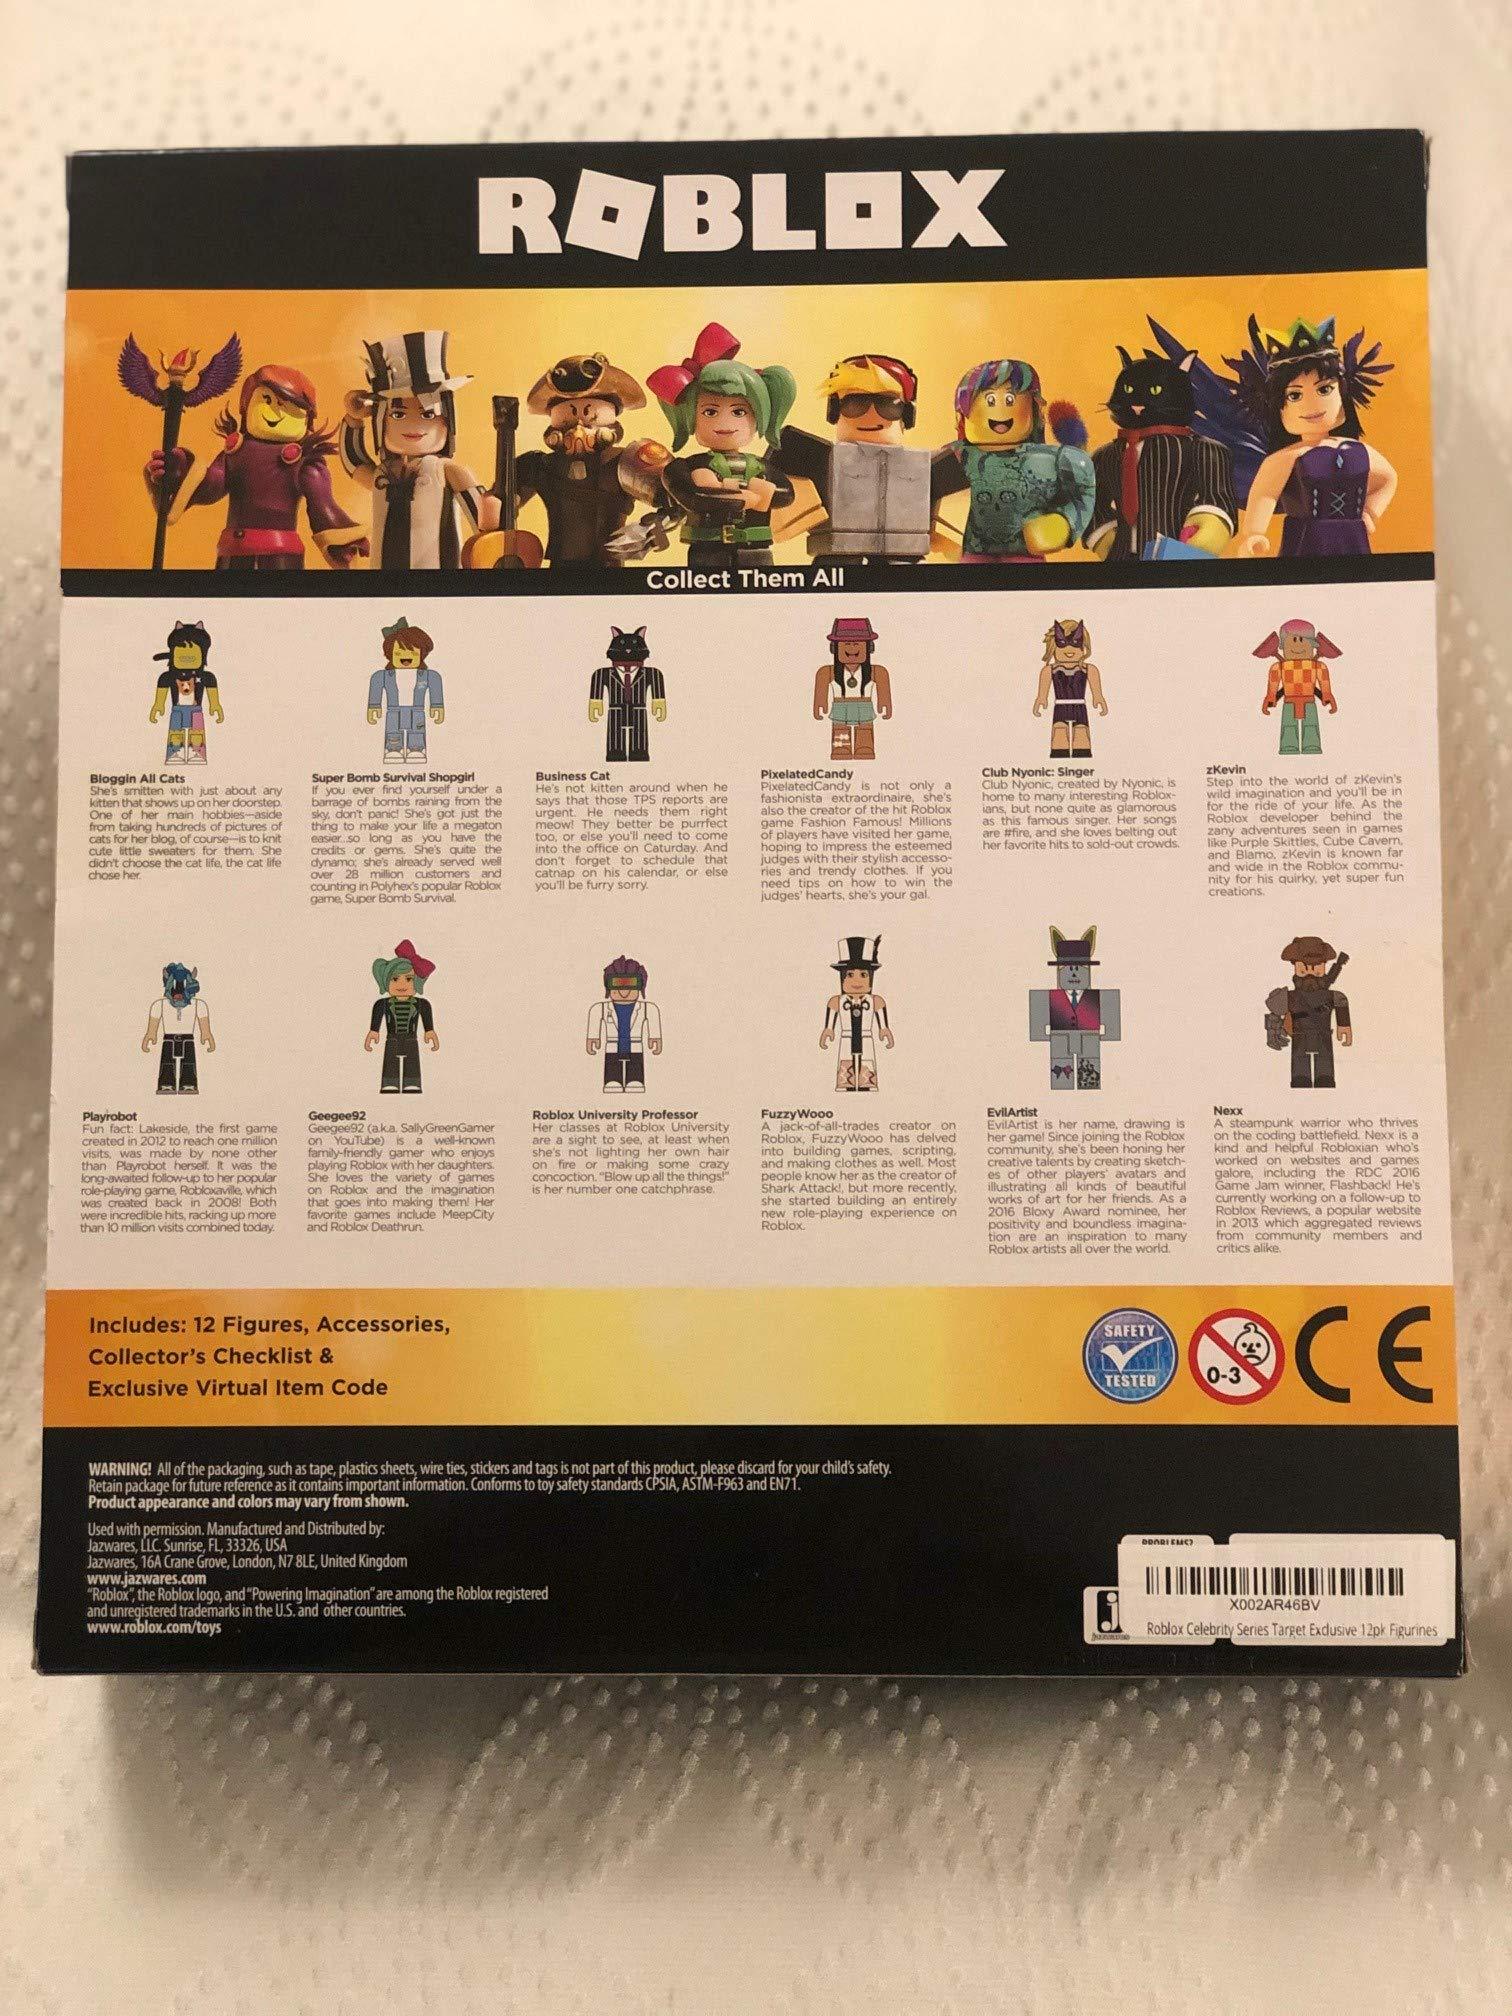 Roblox Target Australia Roblox Celebrity Series Target Exclusive 12pk Figurines Amazon Com Au Toys Games